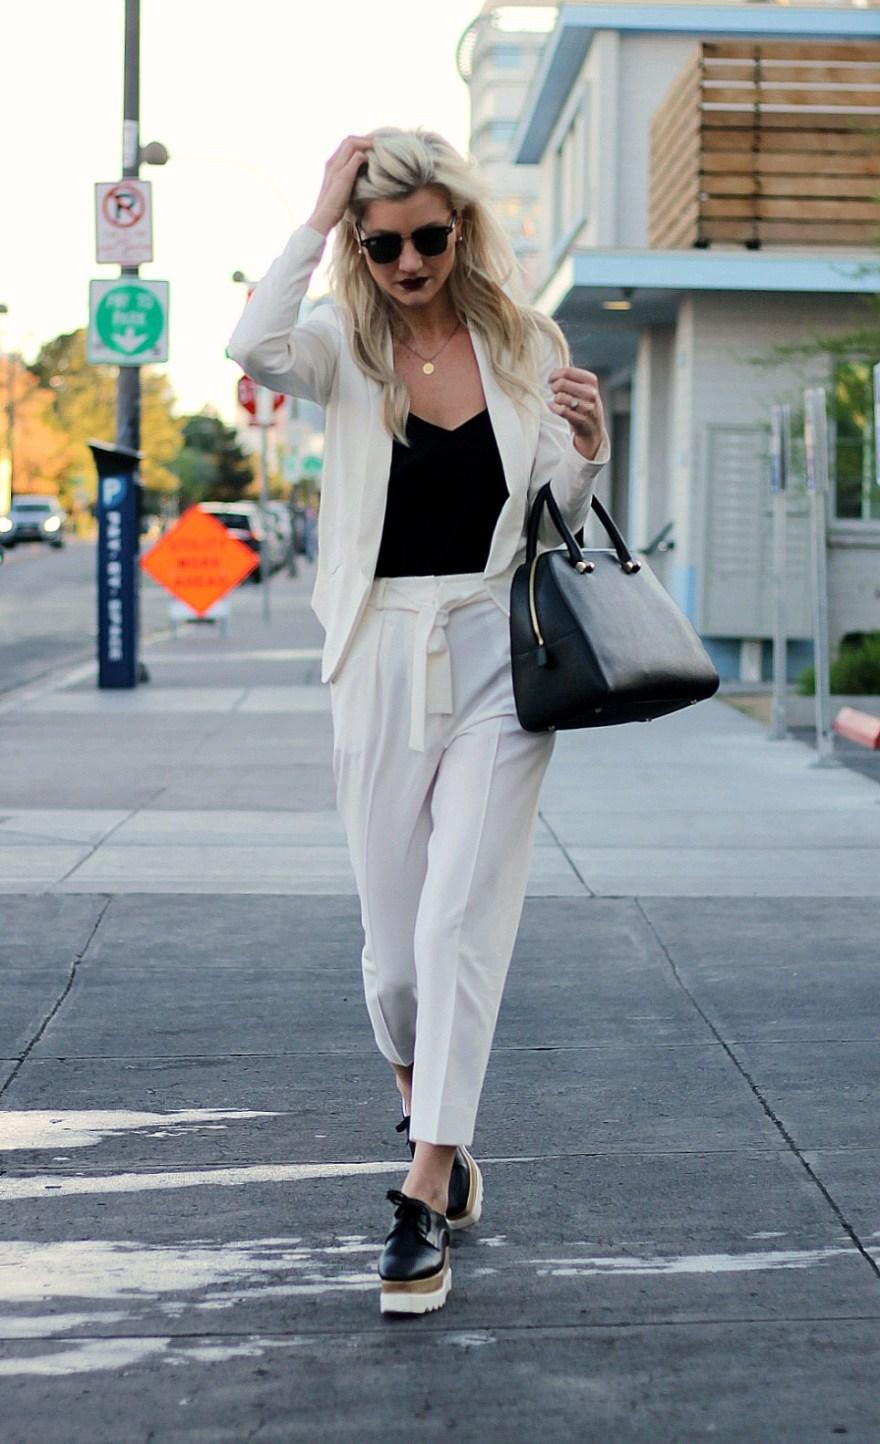 outfit roundup, 2017, 2018 style, fashion blogger, style blogger, beauty blogger, blonde hair, Las Vegas blogger, Lindsey Simon, The Nomis Niche, street style, casual style, feminine style, edgy outfit, outfit inspiration, how to wear, outfit ideas, pantsuit, pant suit, women's suit, matching separates, crawlers, platform shoes, platform oxfords, work outfit ideas, spring outfit ideas, furla bag, street style, outfit inspiration